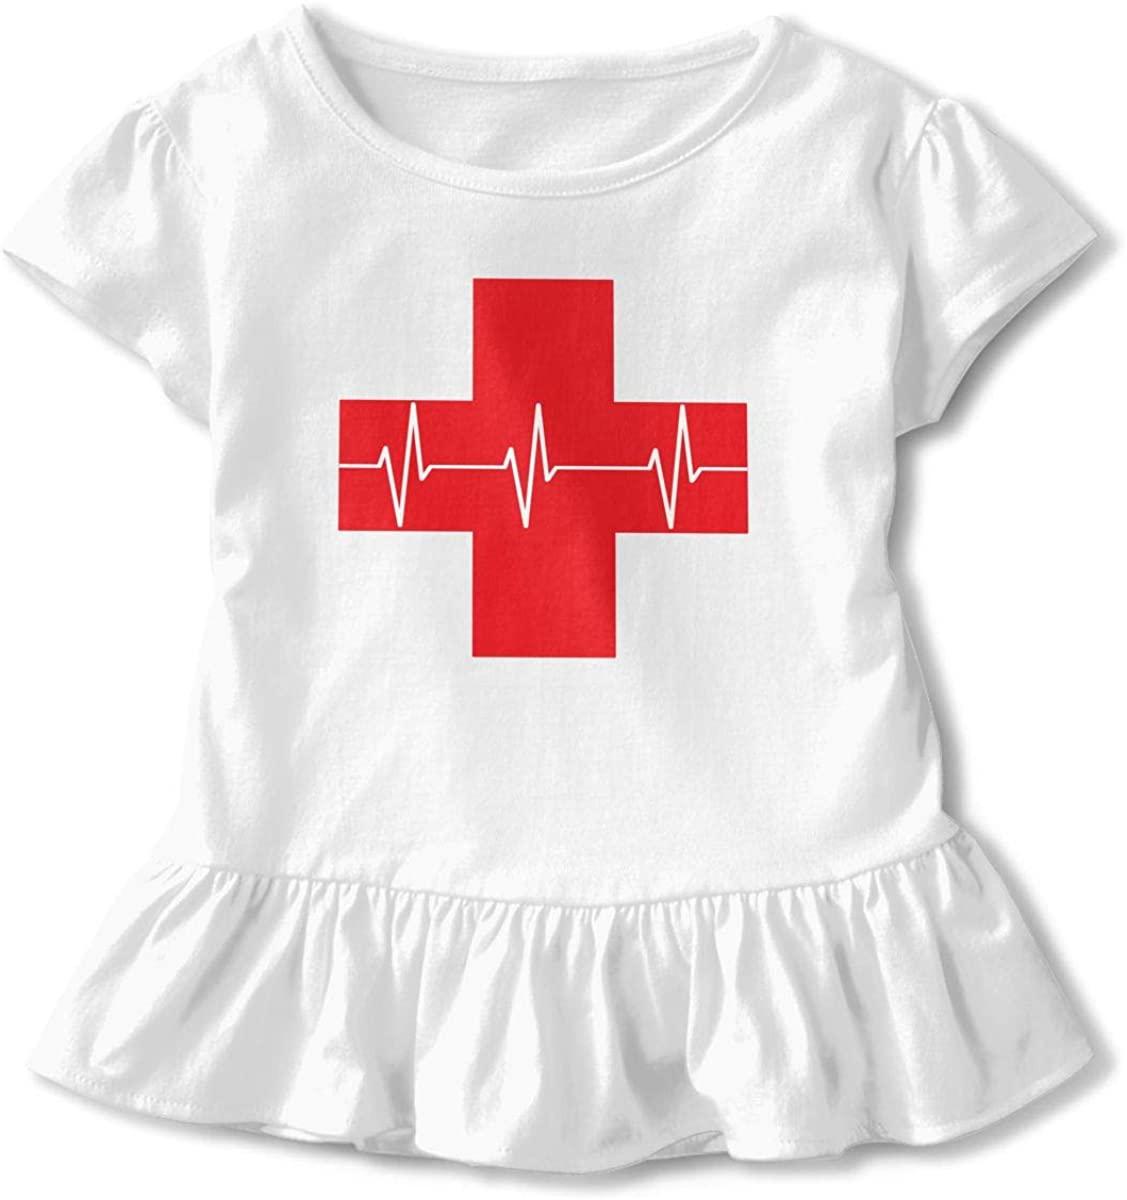 EASON-G Toddler Girl's Ruffle T-Shirt First Aid Cardiopulmonary Doctor Short Sleeve 2-6T